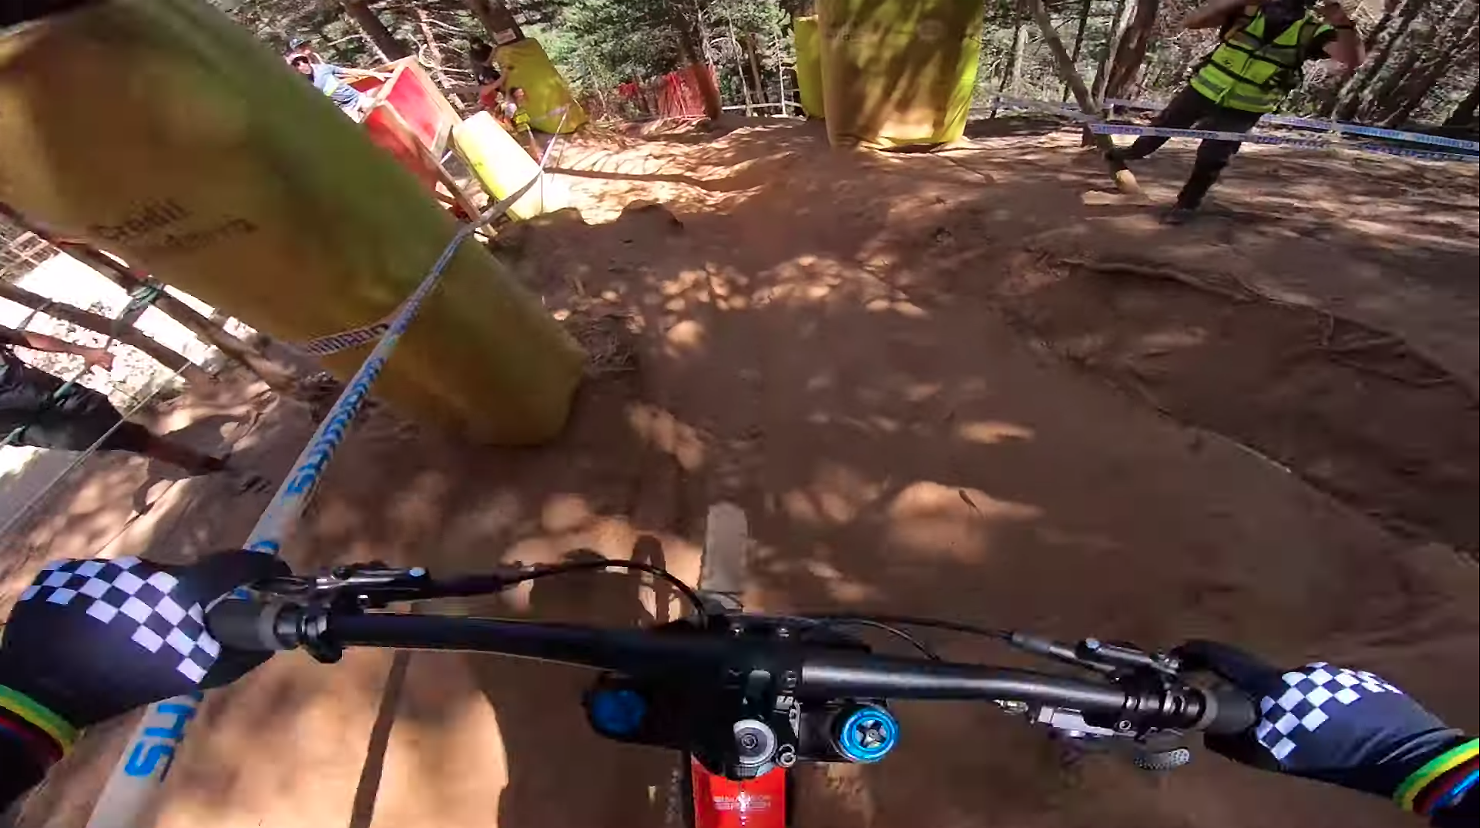 JUST HAULING! Watch Danny Hart's Wild Race Run Down Andorra